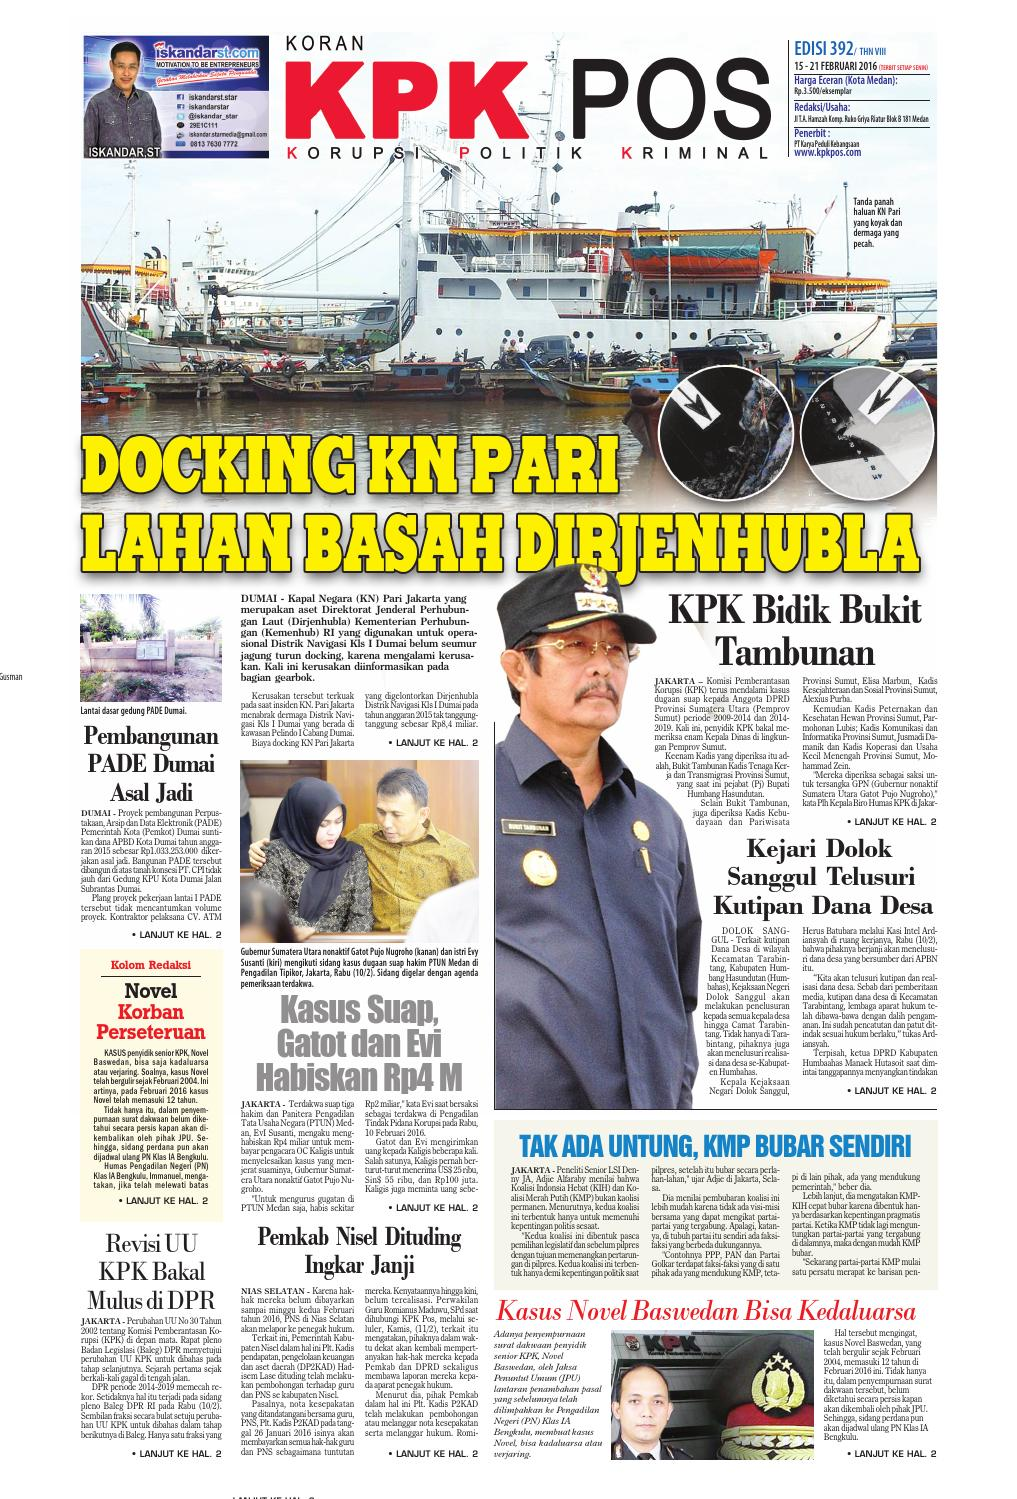 Epaper kpkpos 392 edisi senin 15 februari 2016 by media andalas - issuu 76acdabcbf